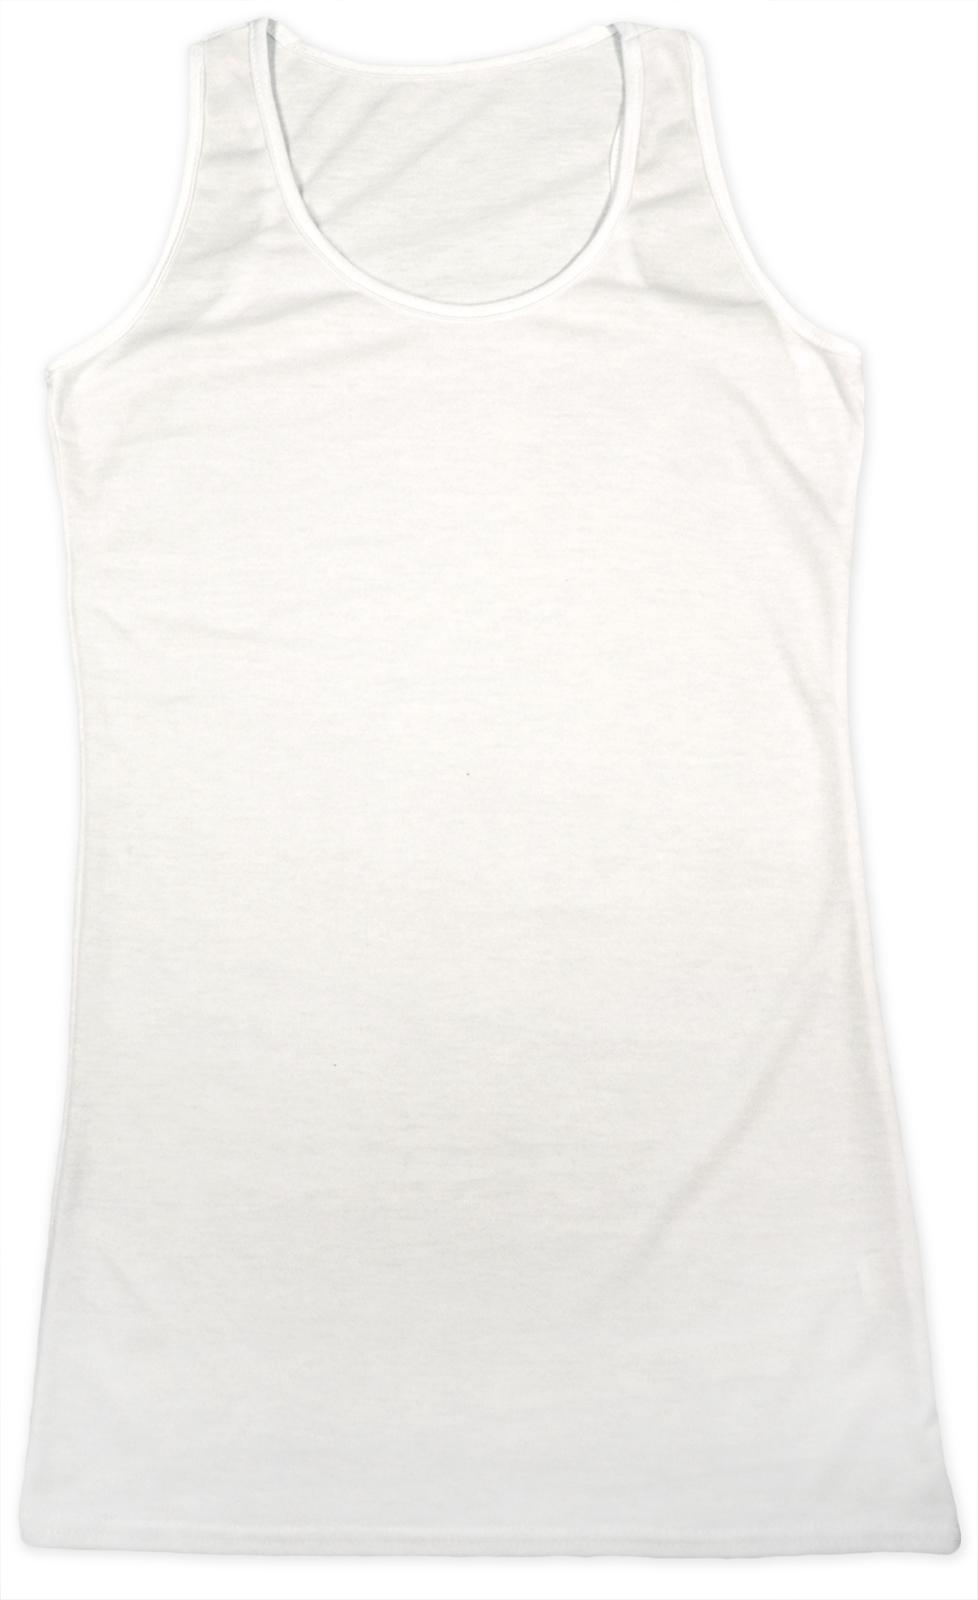 c160eeee8 Ladies New Plain Vest Top Womens Summer Stretch Long Cream T Shirt UK Size  S M L